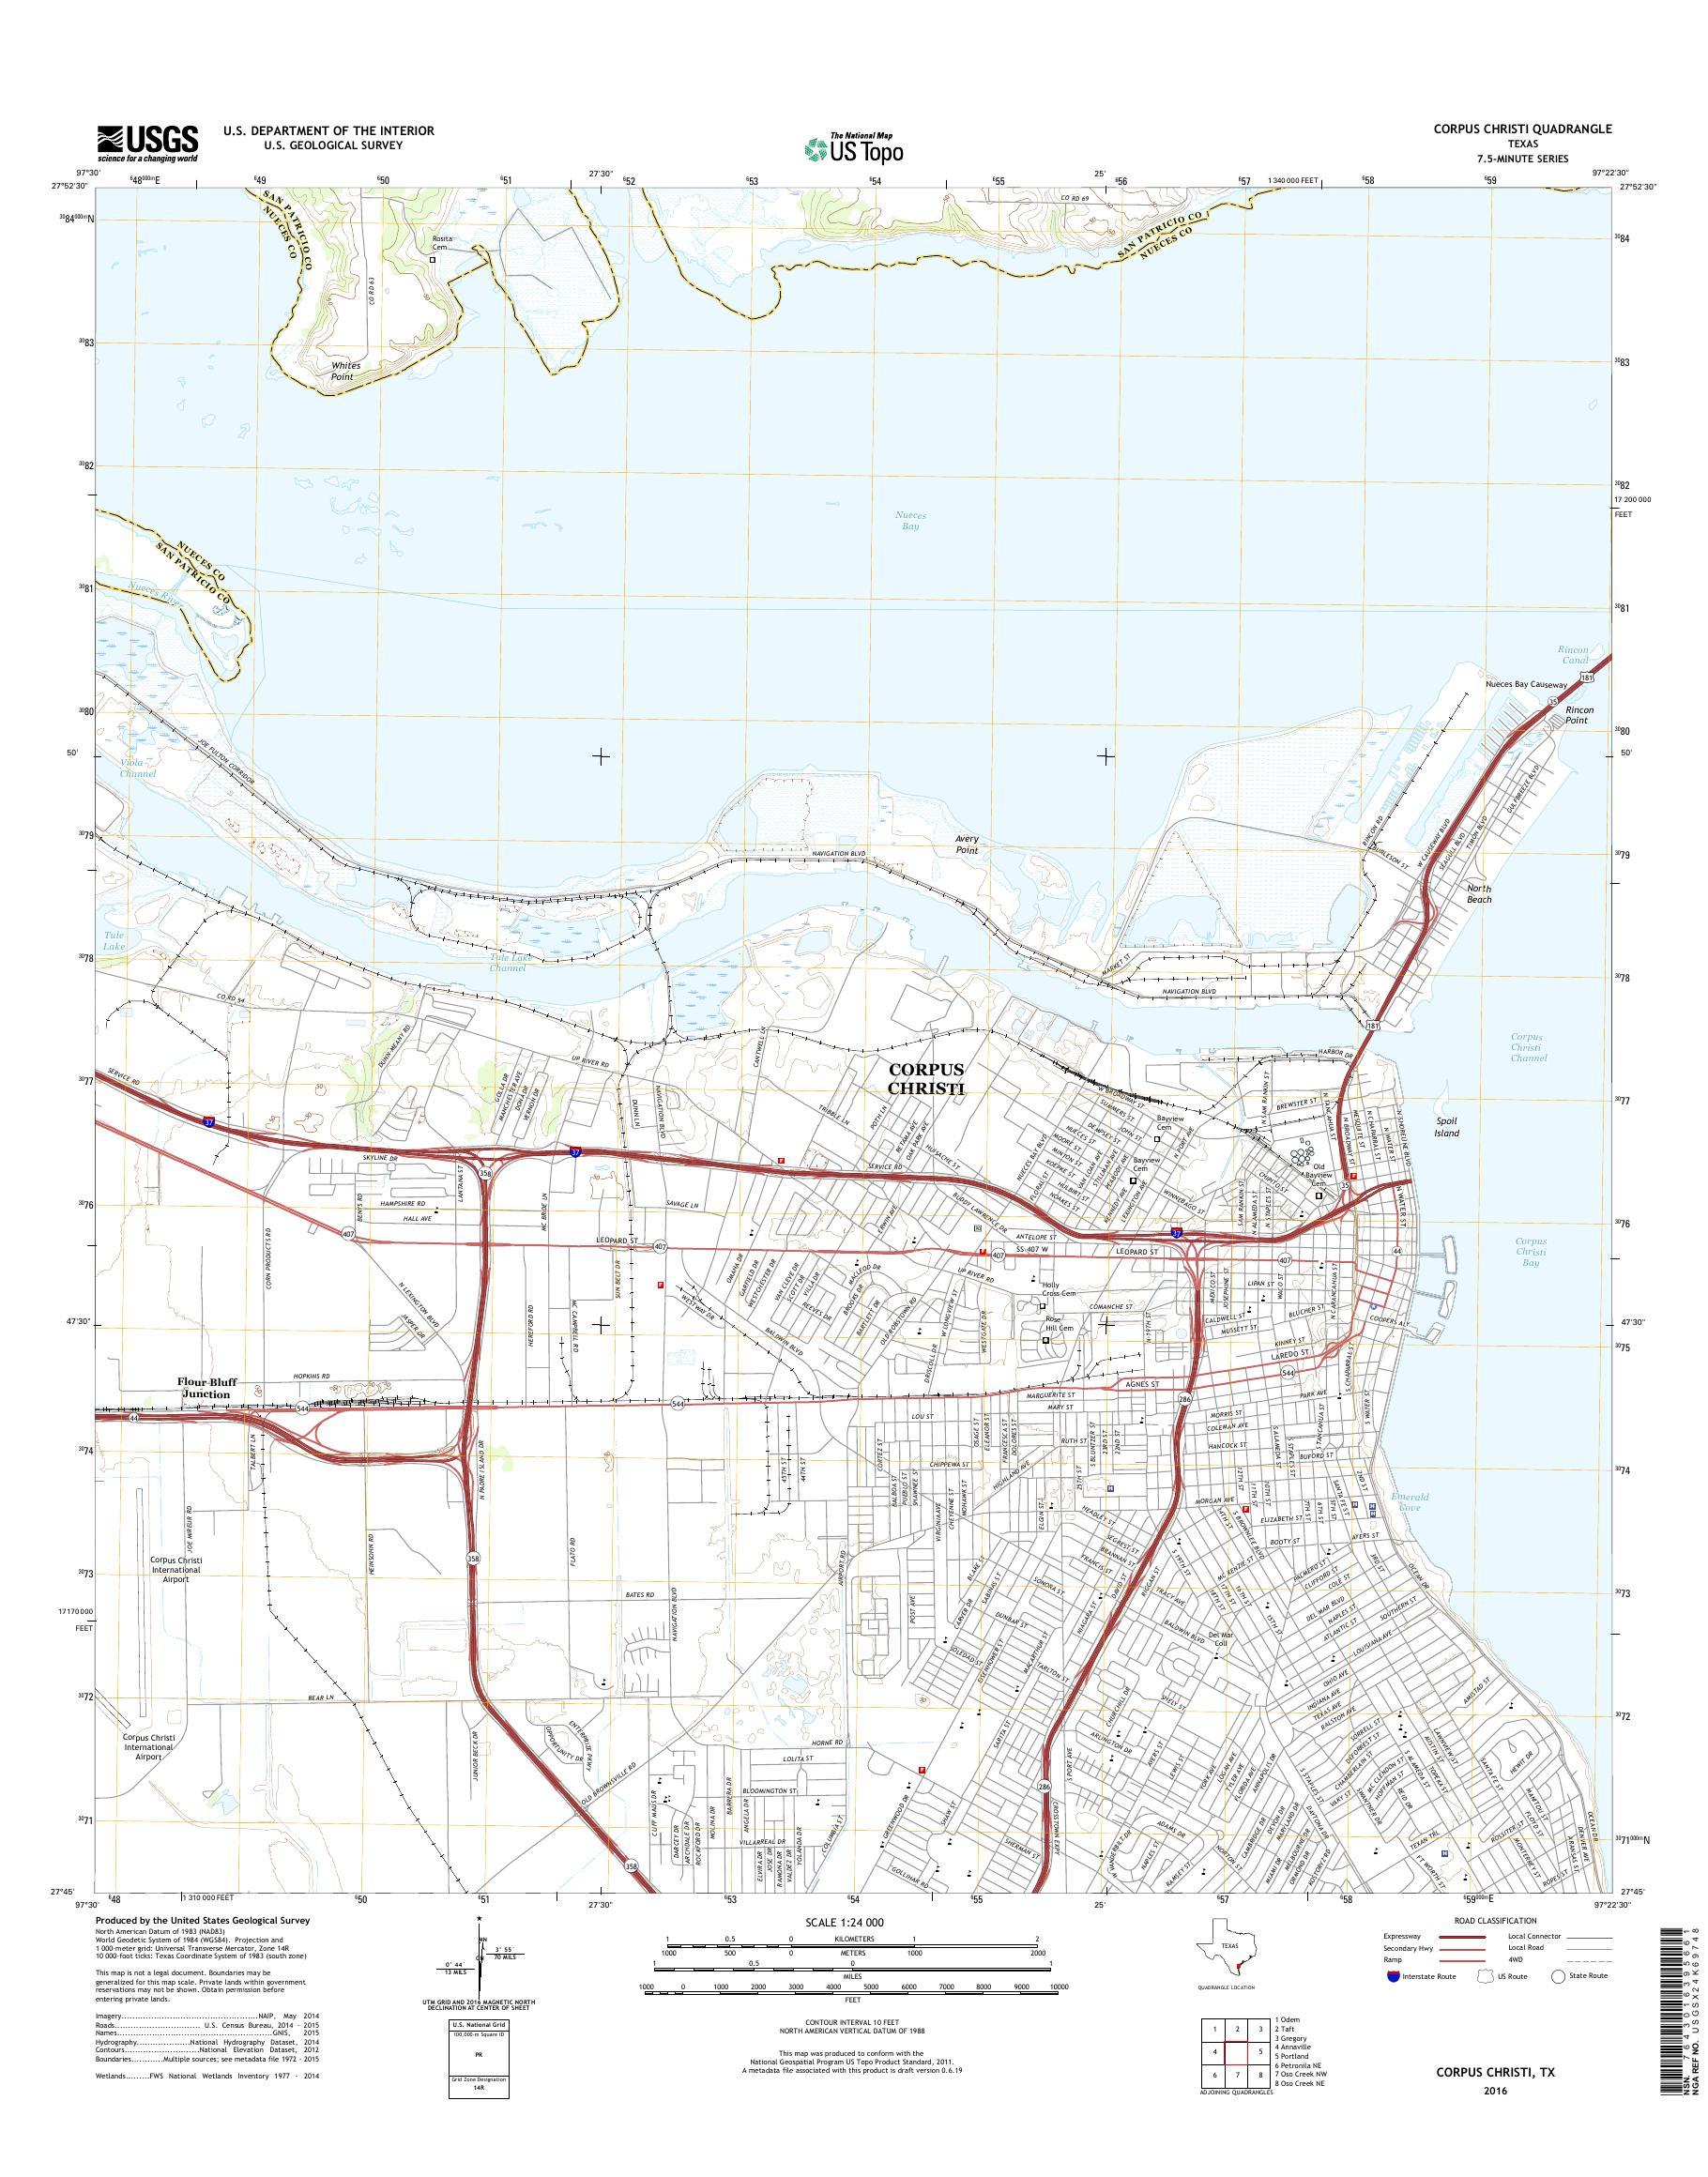 Corpus Christi Map Of Texas.Mytopo Corpus Christi Texas Usgs Quad Topo Map